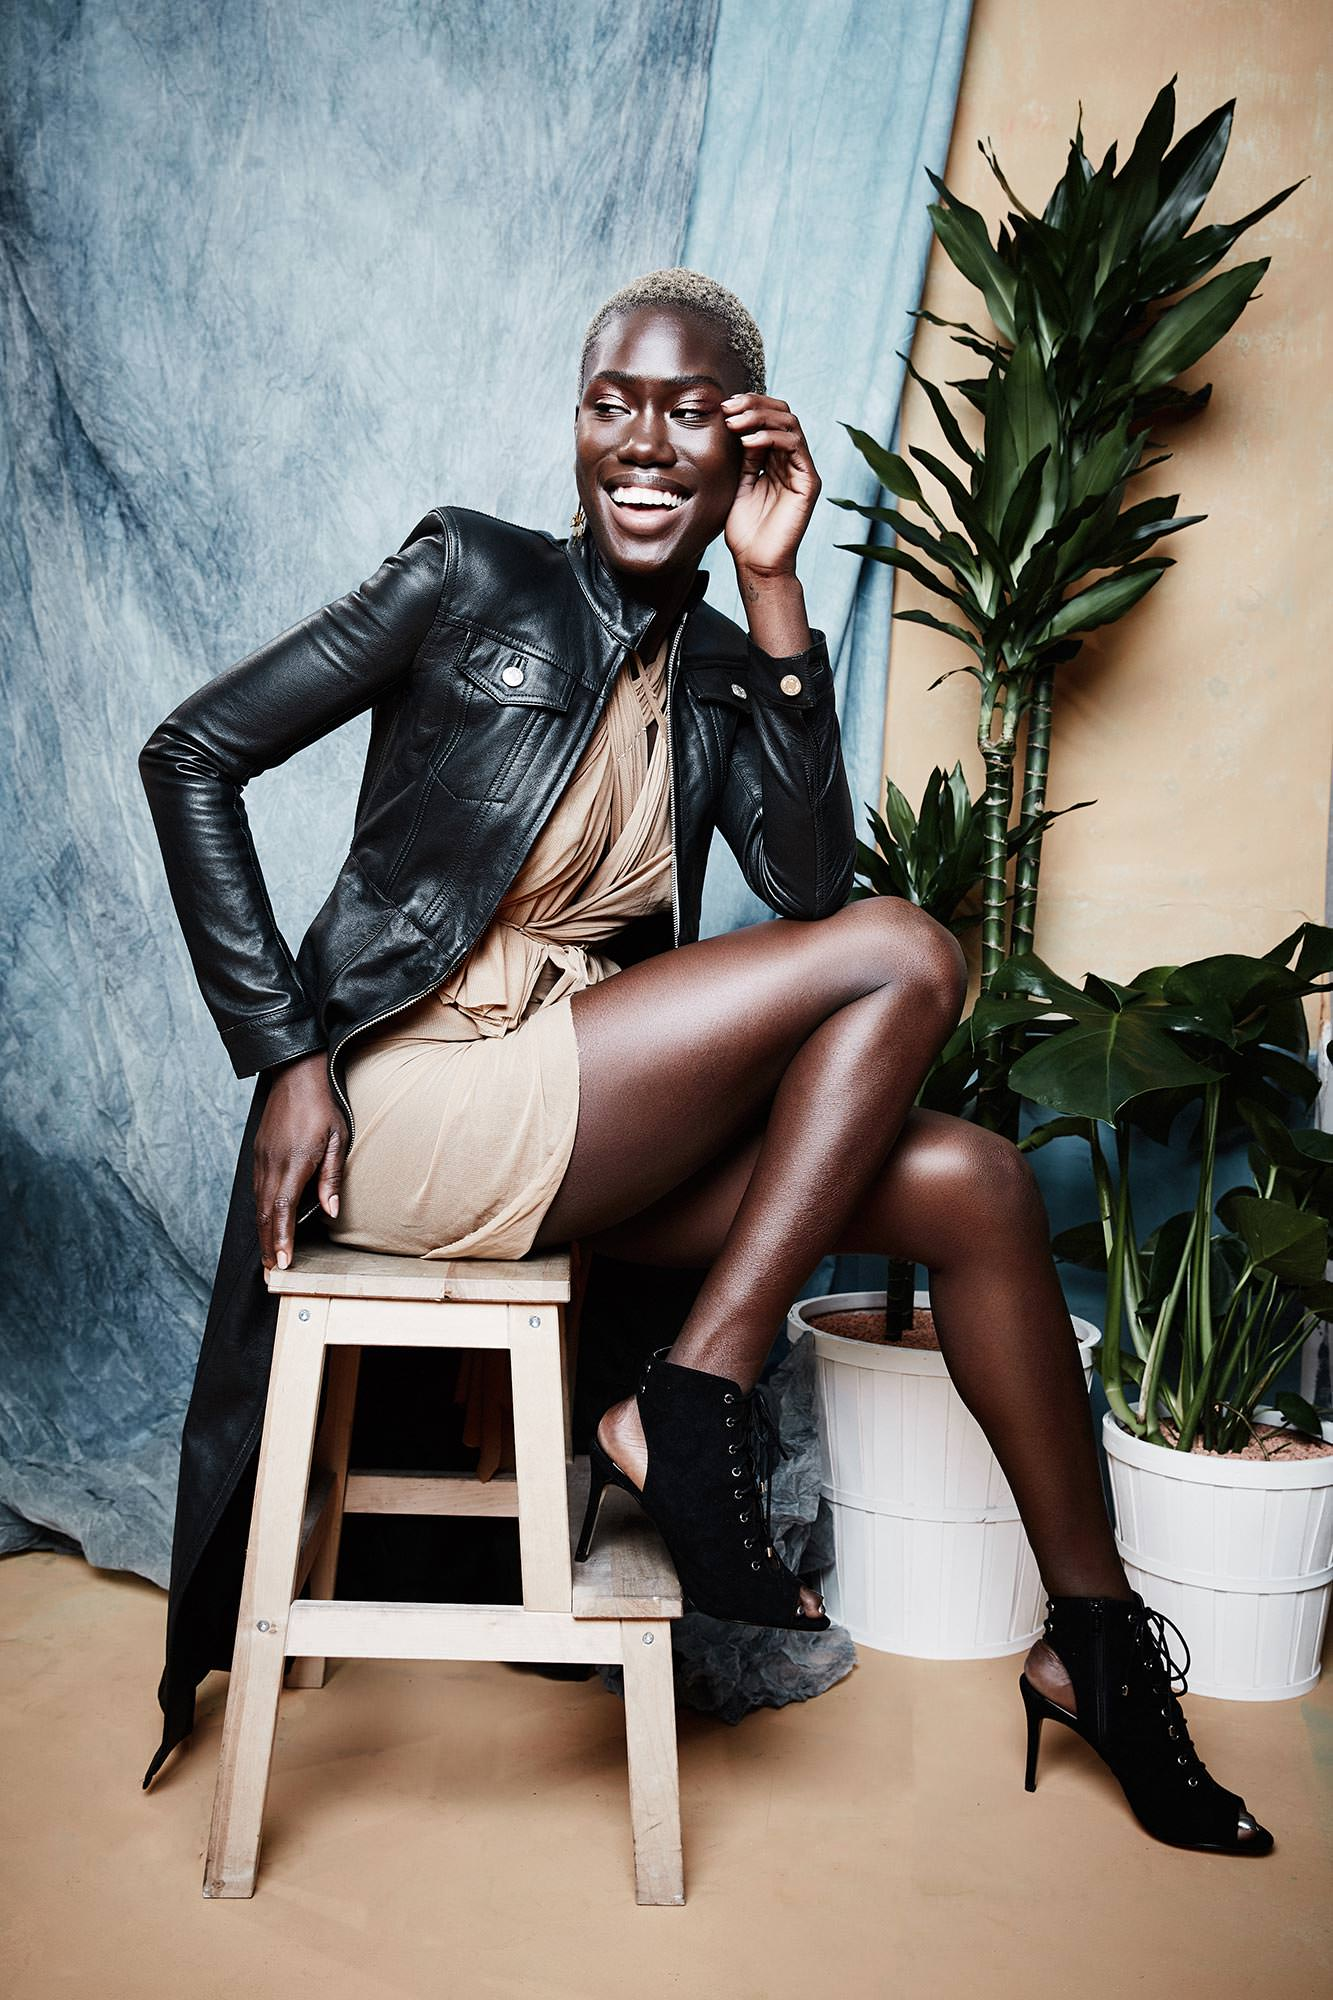 Aminata from Germanys Next Top Model